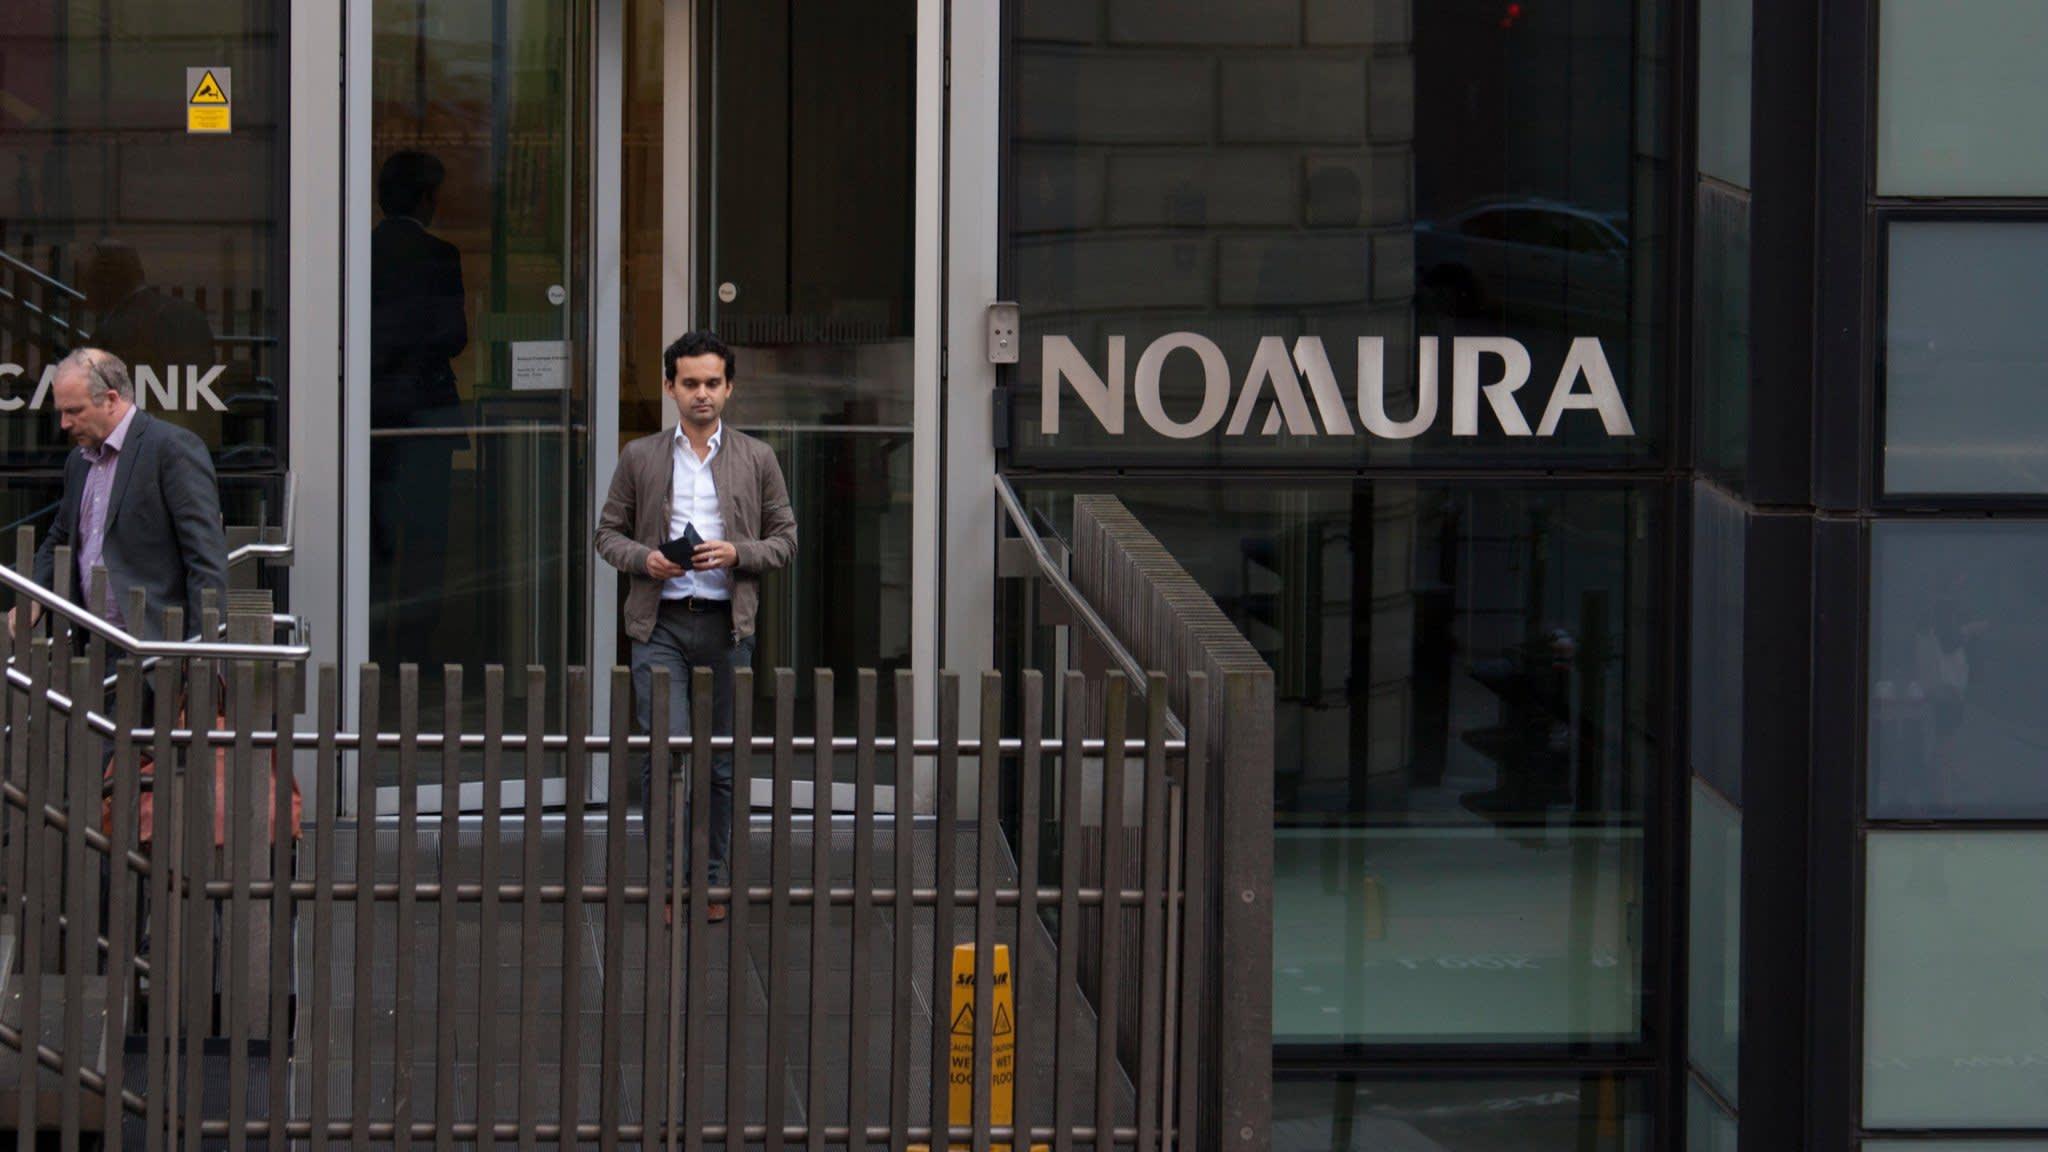 Nomura looks to Paris as post-Brexit EU lending hub